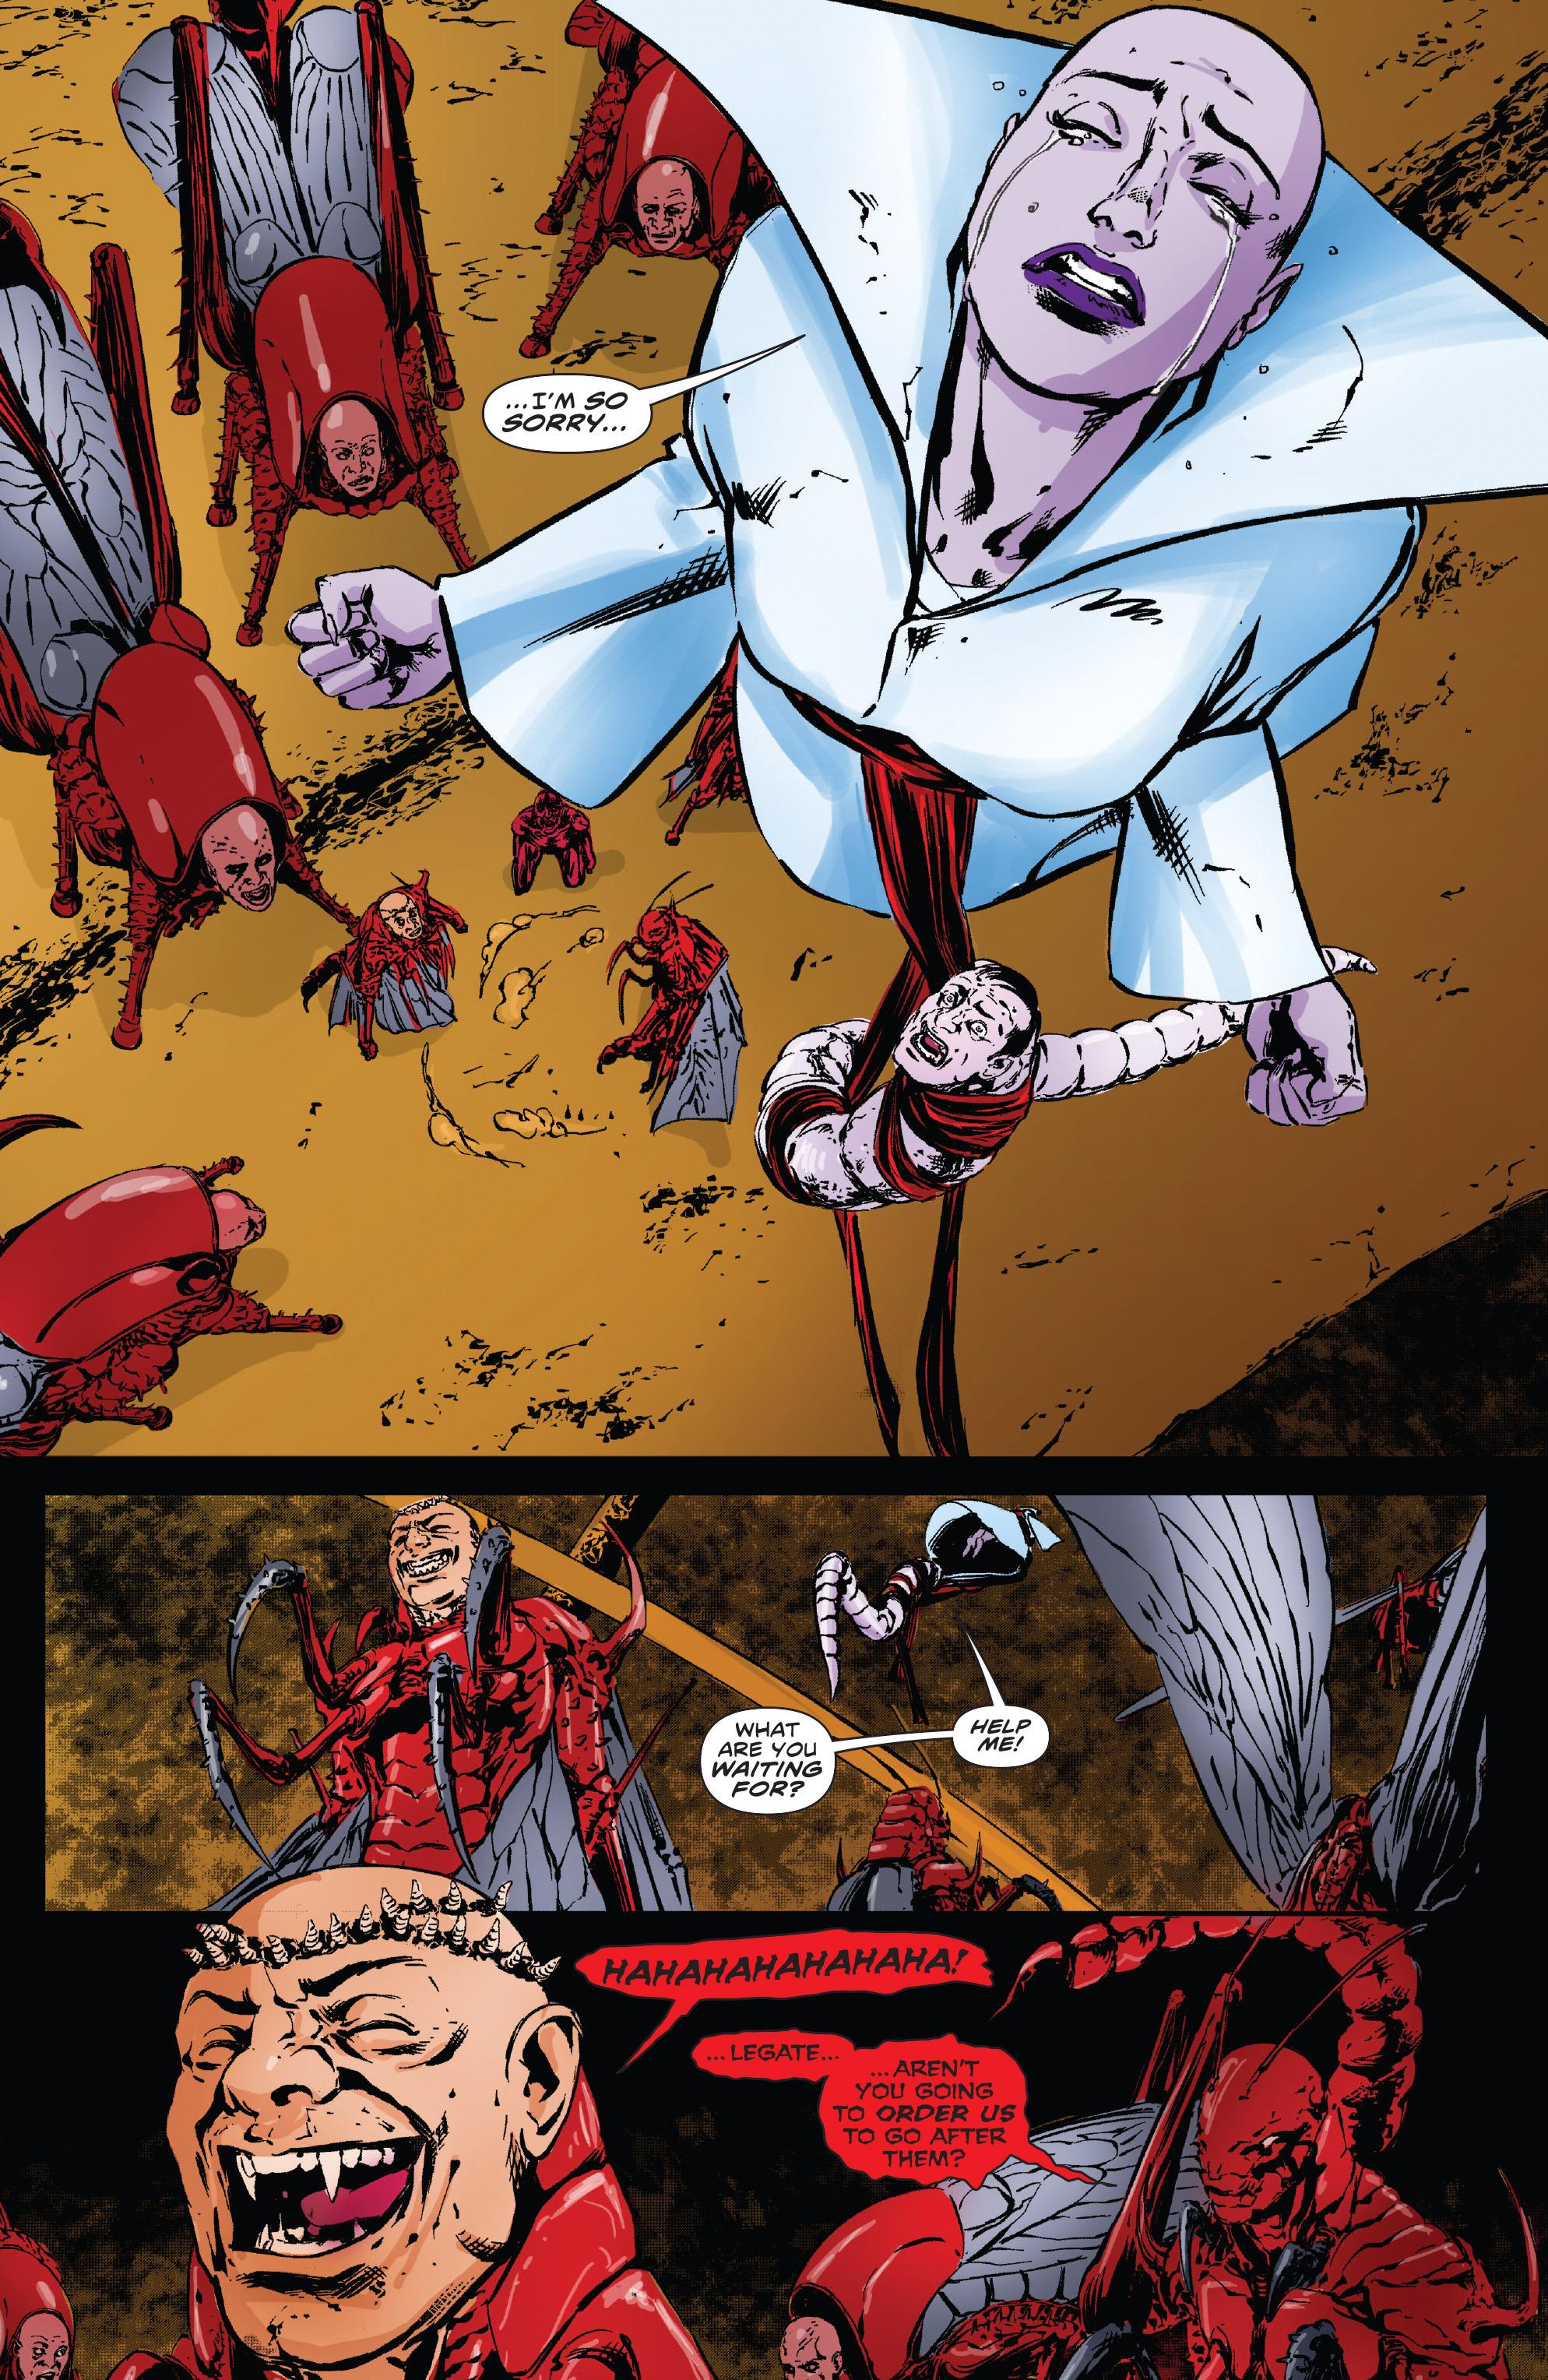 Read online Clive Barker's Hellraiser: The Dark Watch comic -  Issue # TPB 3 - 107